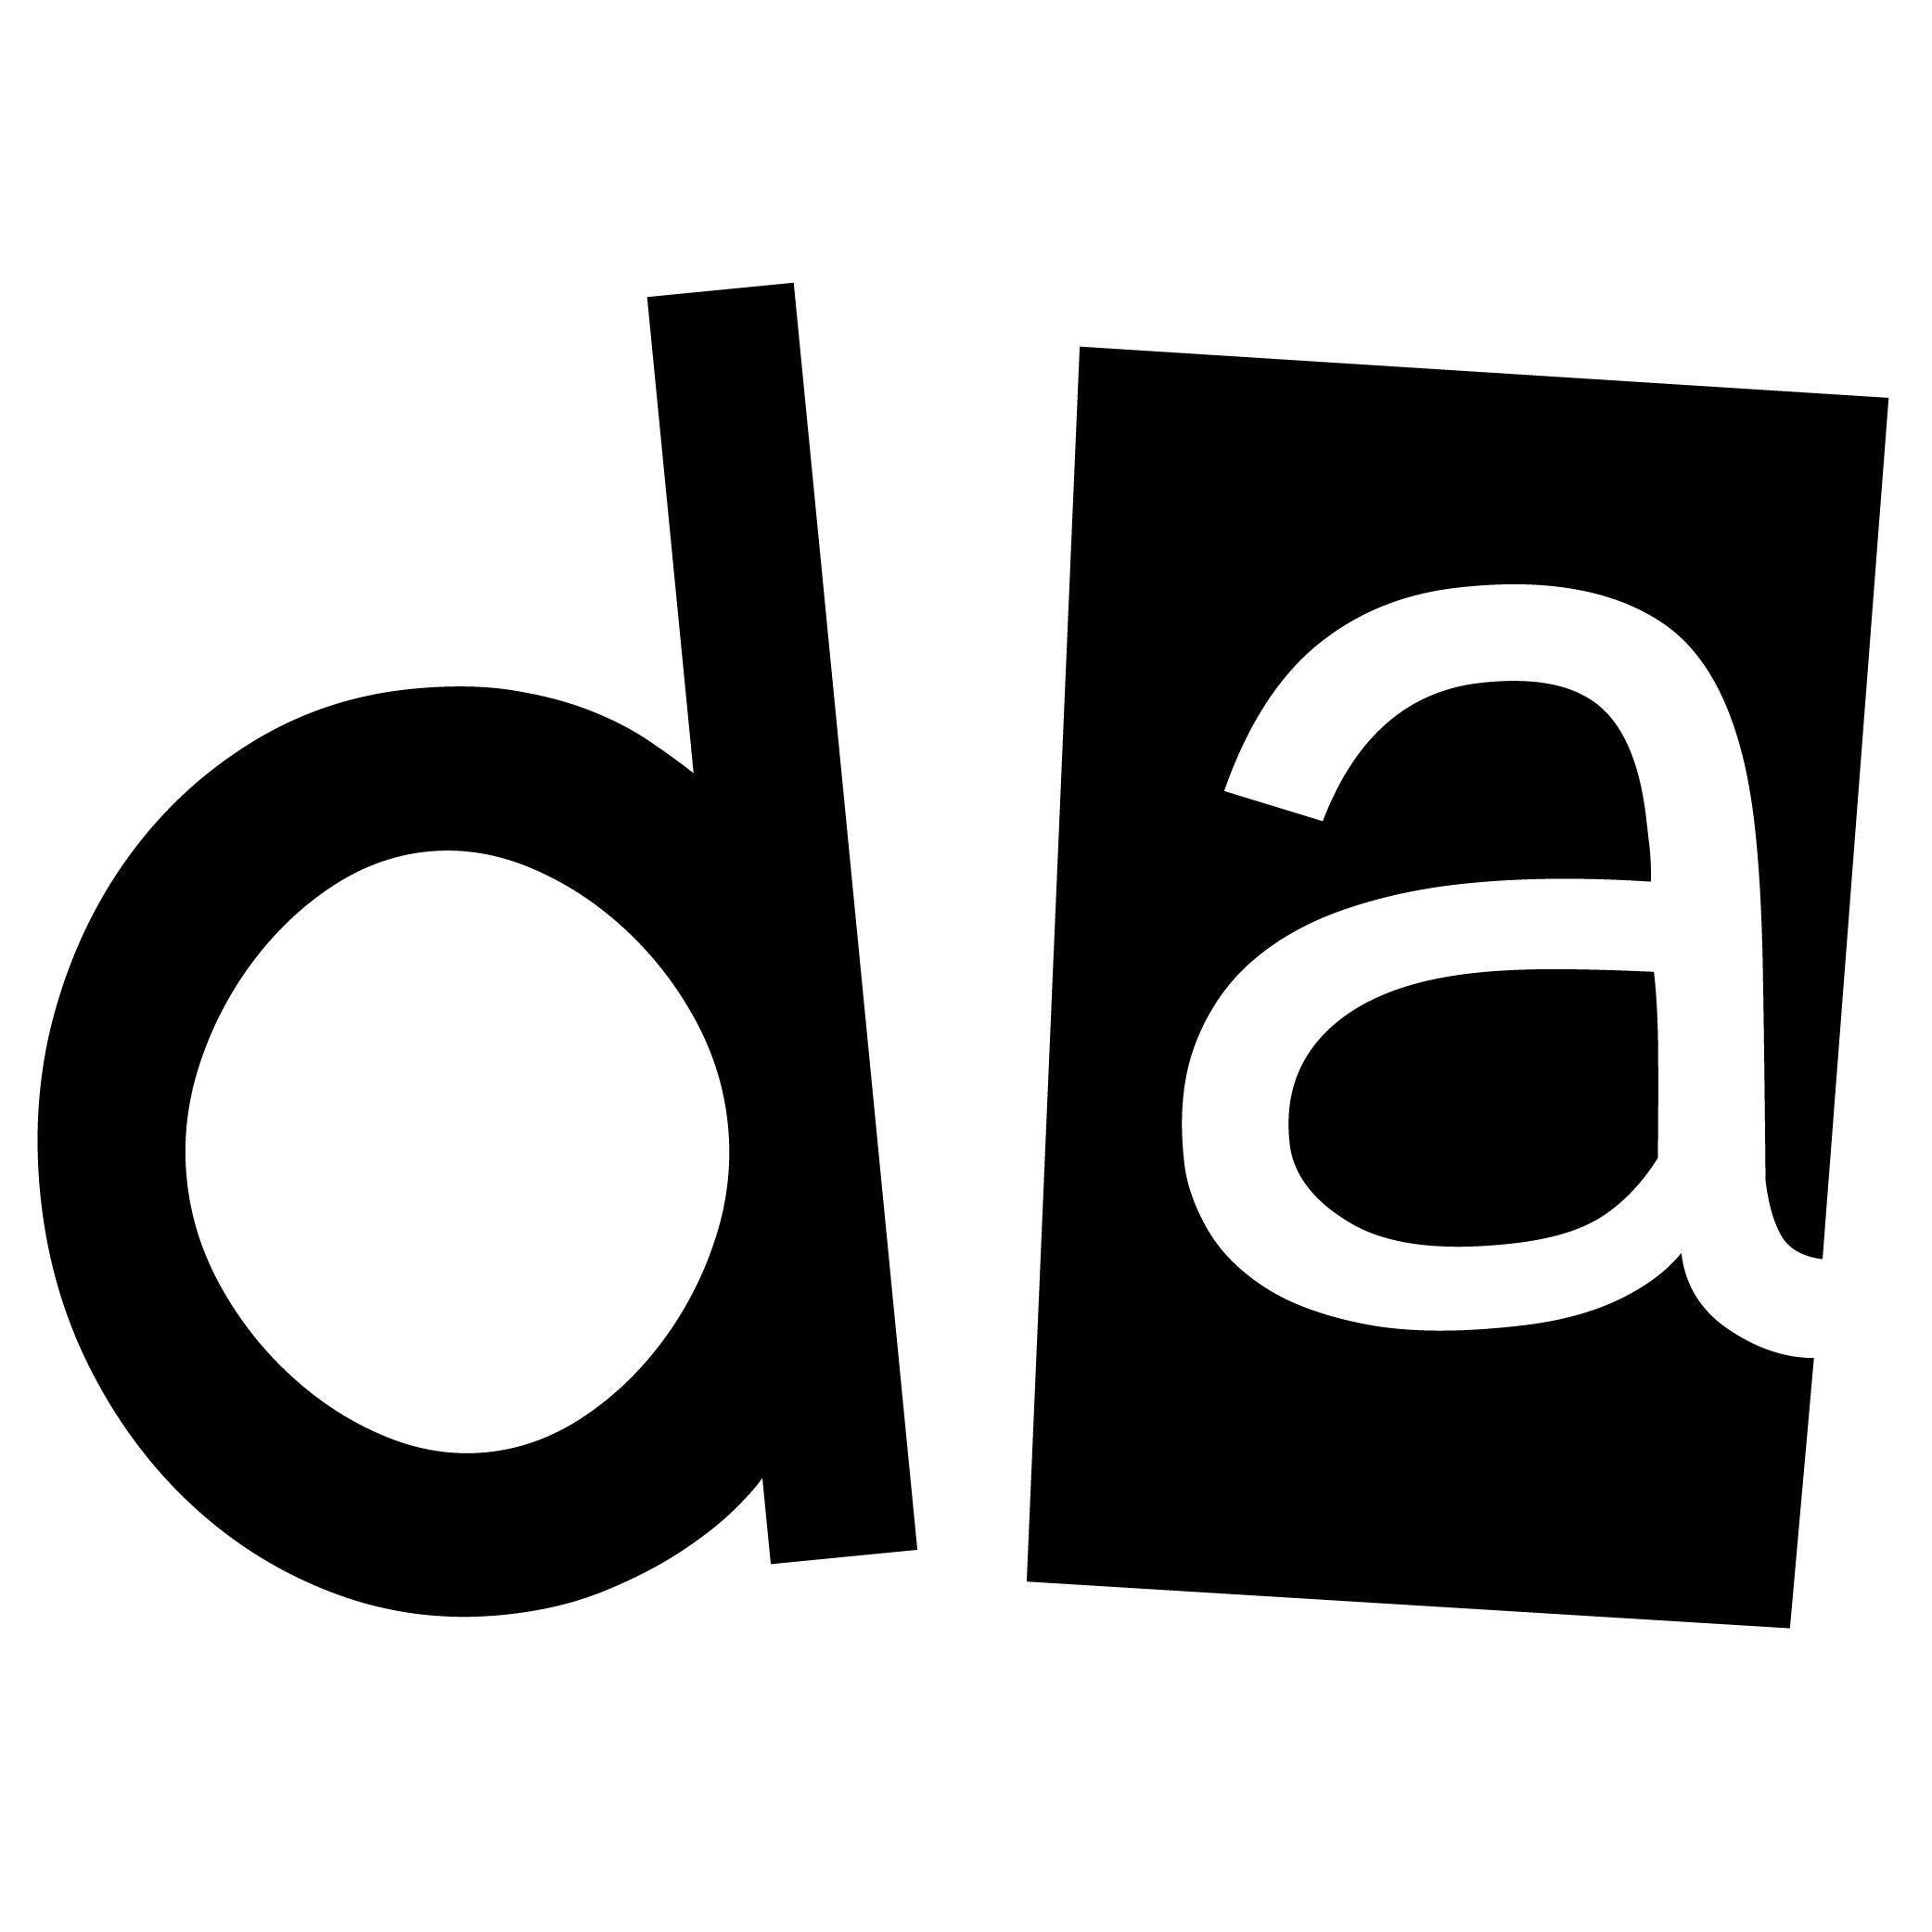 Om aumohm decal sticker laptop sticker macbook decal om aumohm decal sticker laptop sticker macbook decal yoga symbol sticker spiritual sign tablet sticker omkara decal biocorpaavc Images